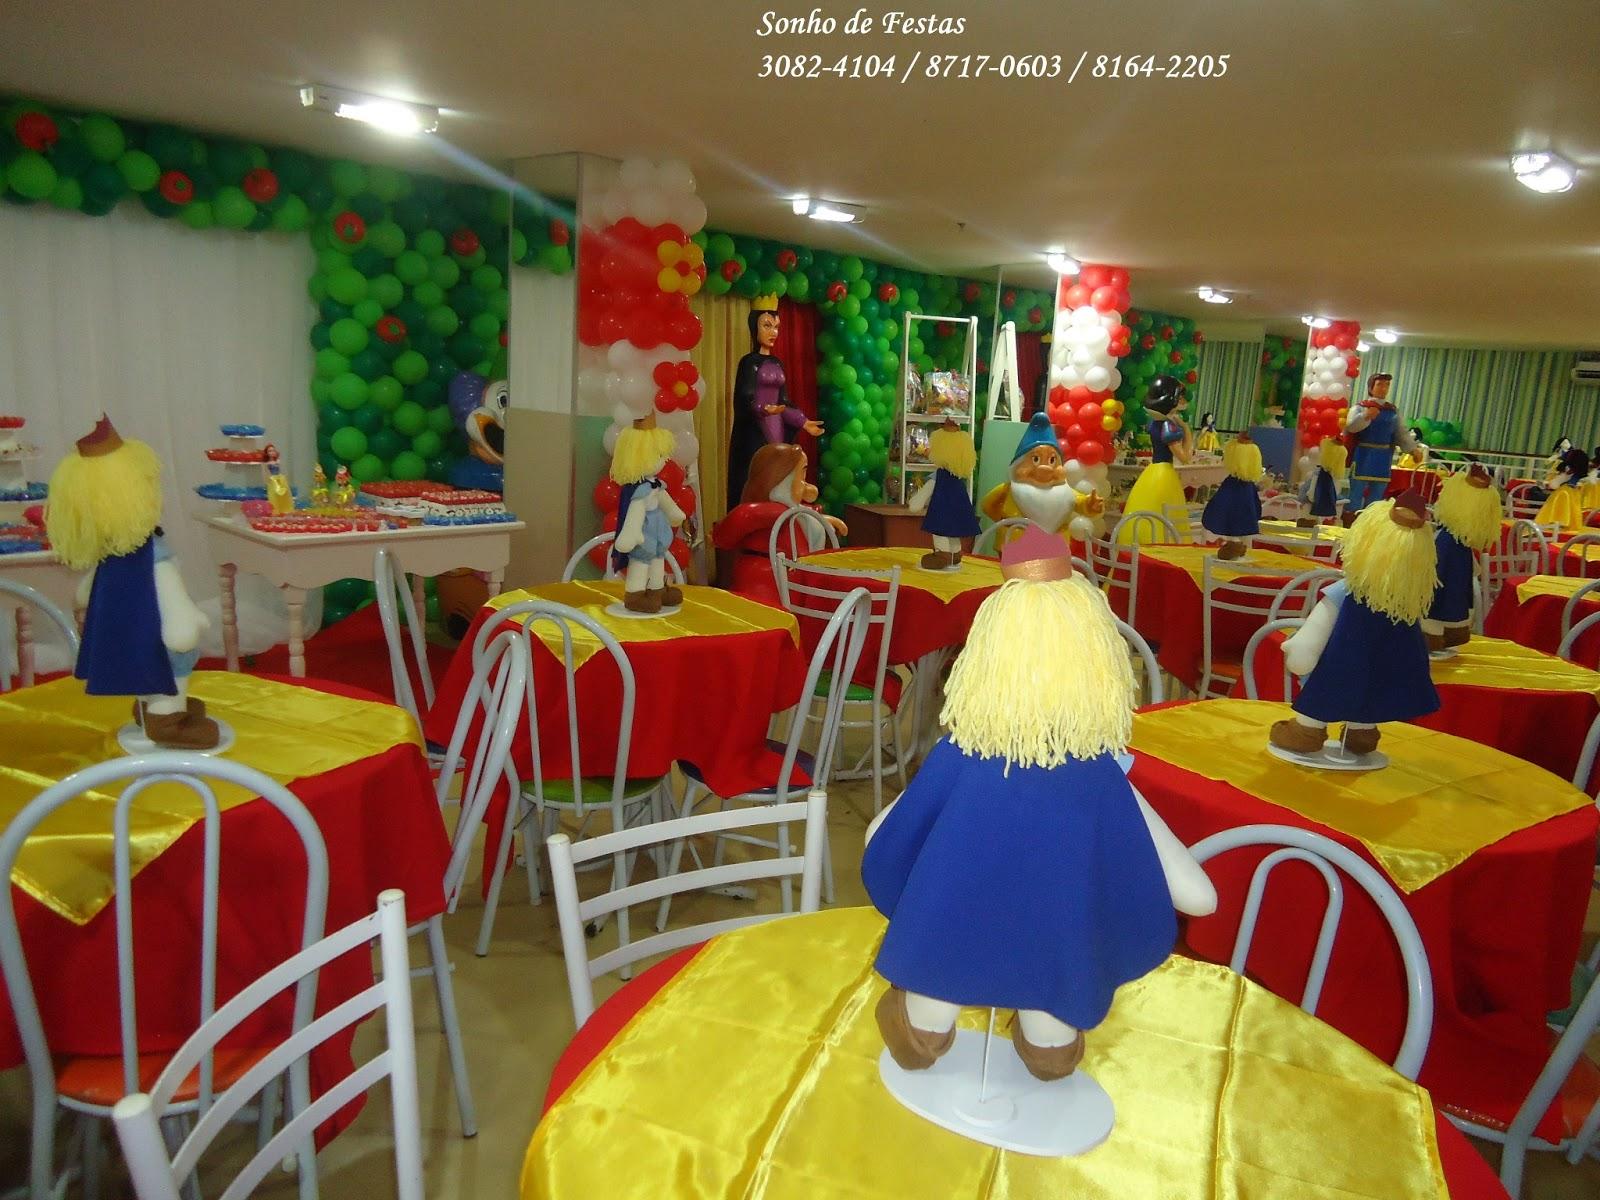 decoracao festa branca de neve provencal:Festa provençal Branca de Neve com Fibras